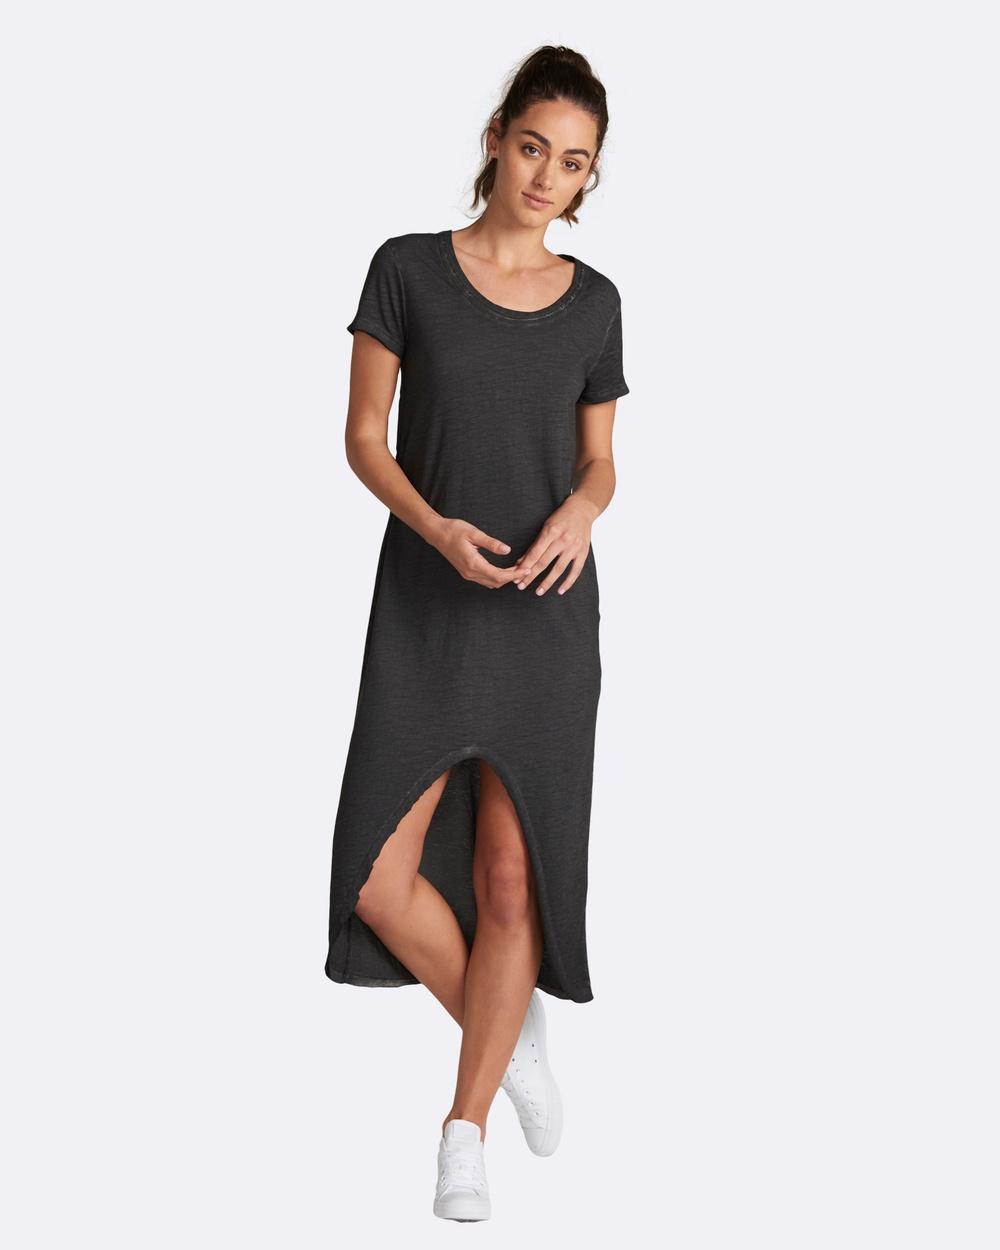 jac + mooki Maisie Dress Dresses Black Maisie Dress